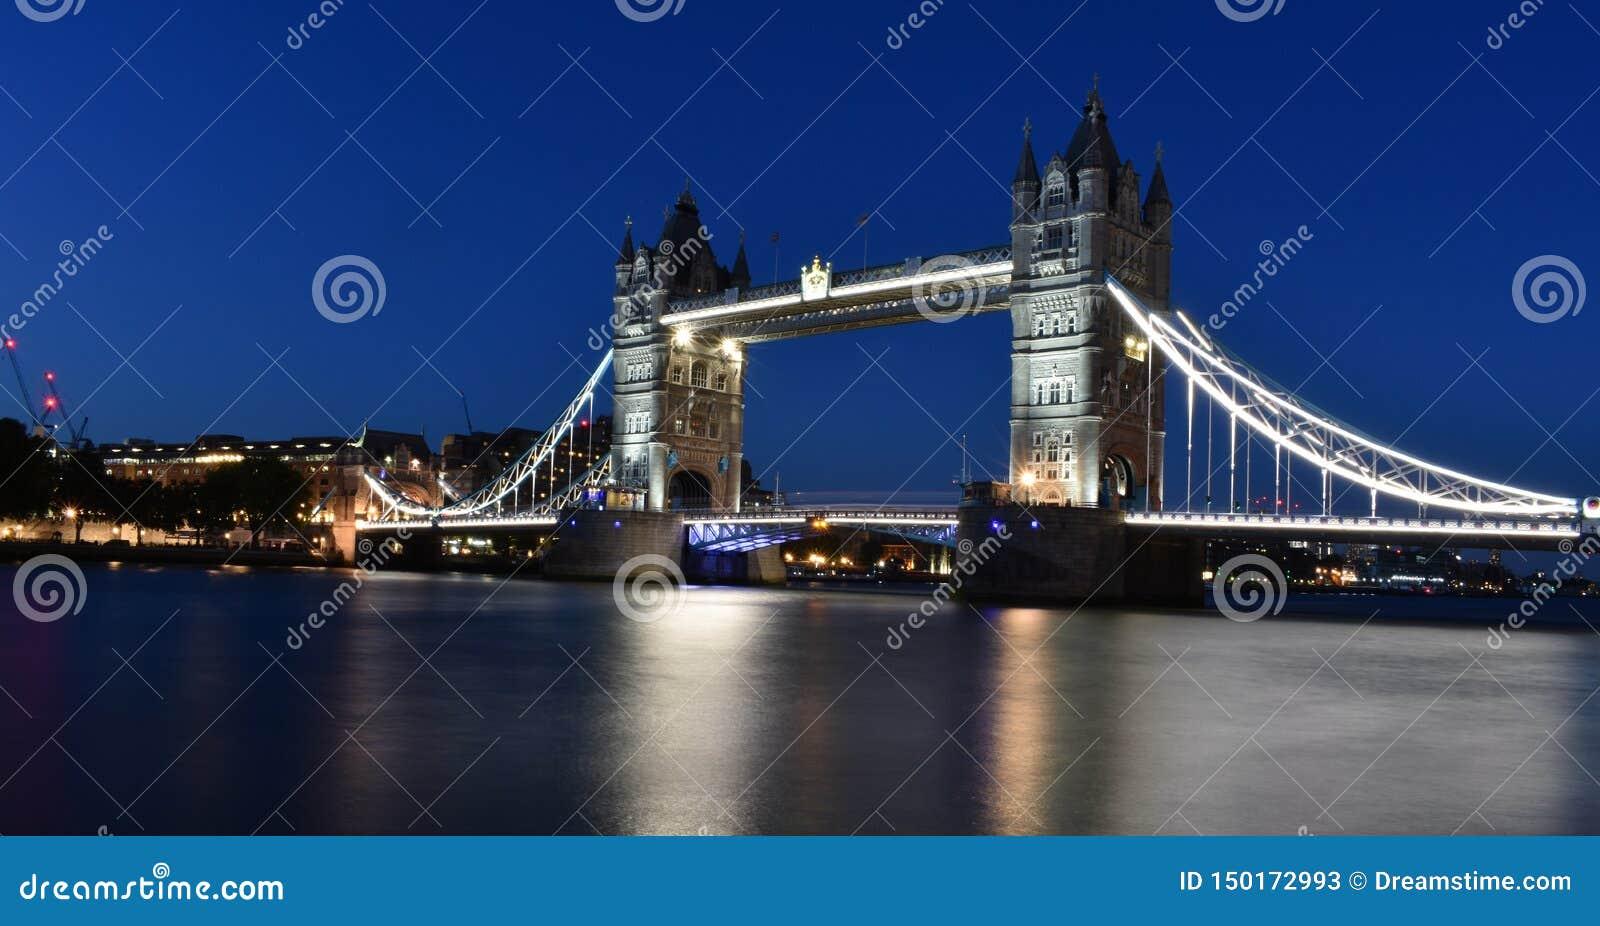 A night With Tower Bridge London